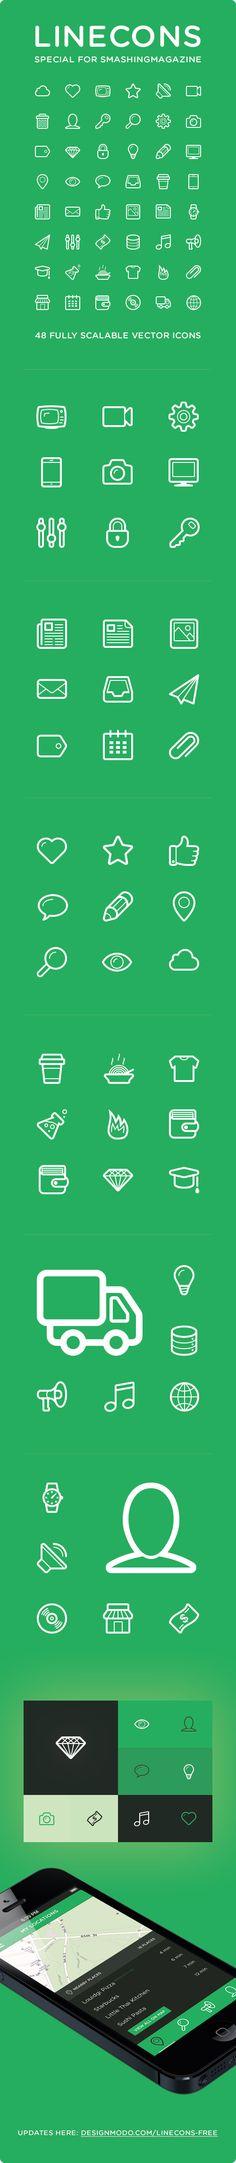 Linecons - Free Icon Set